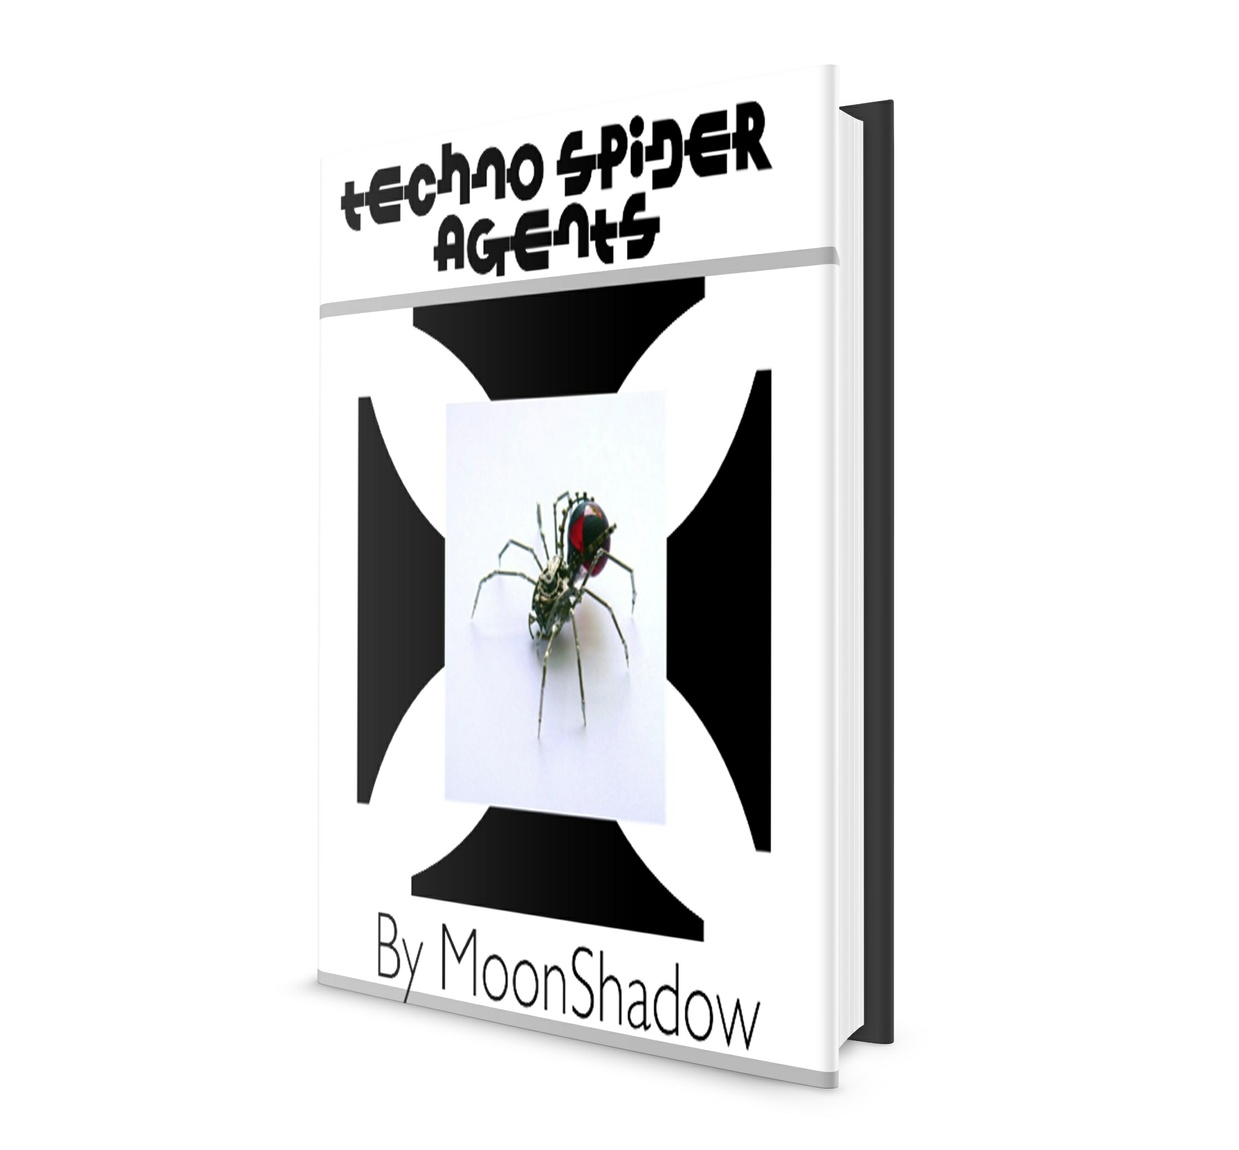 Techno Spider Agents